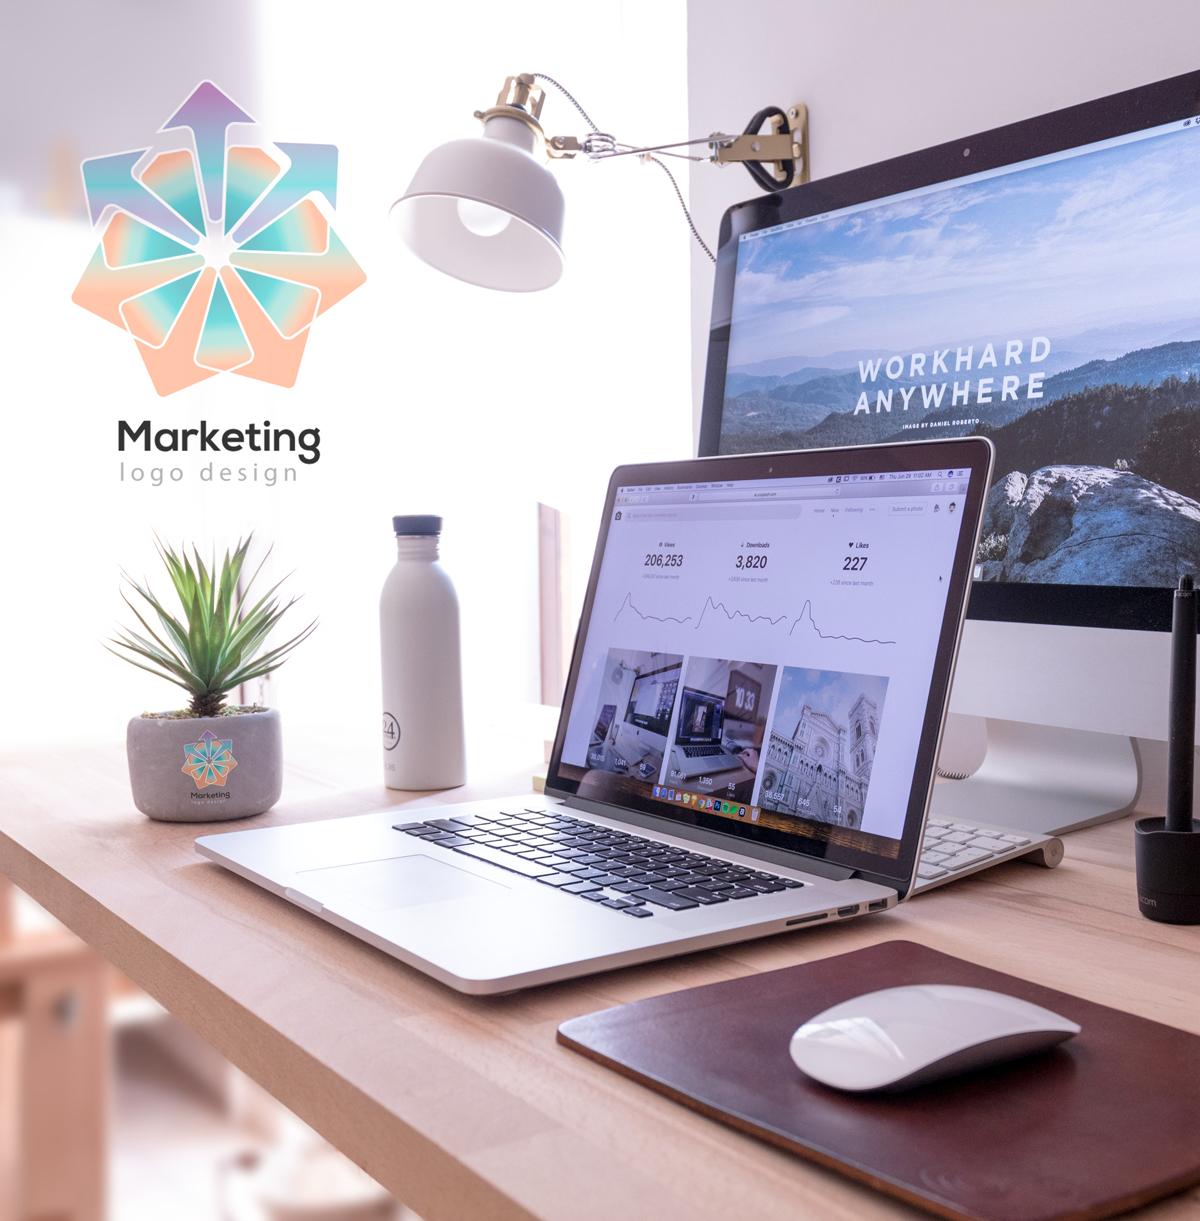 marketing-logo-design-brand-identity-mockup